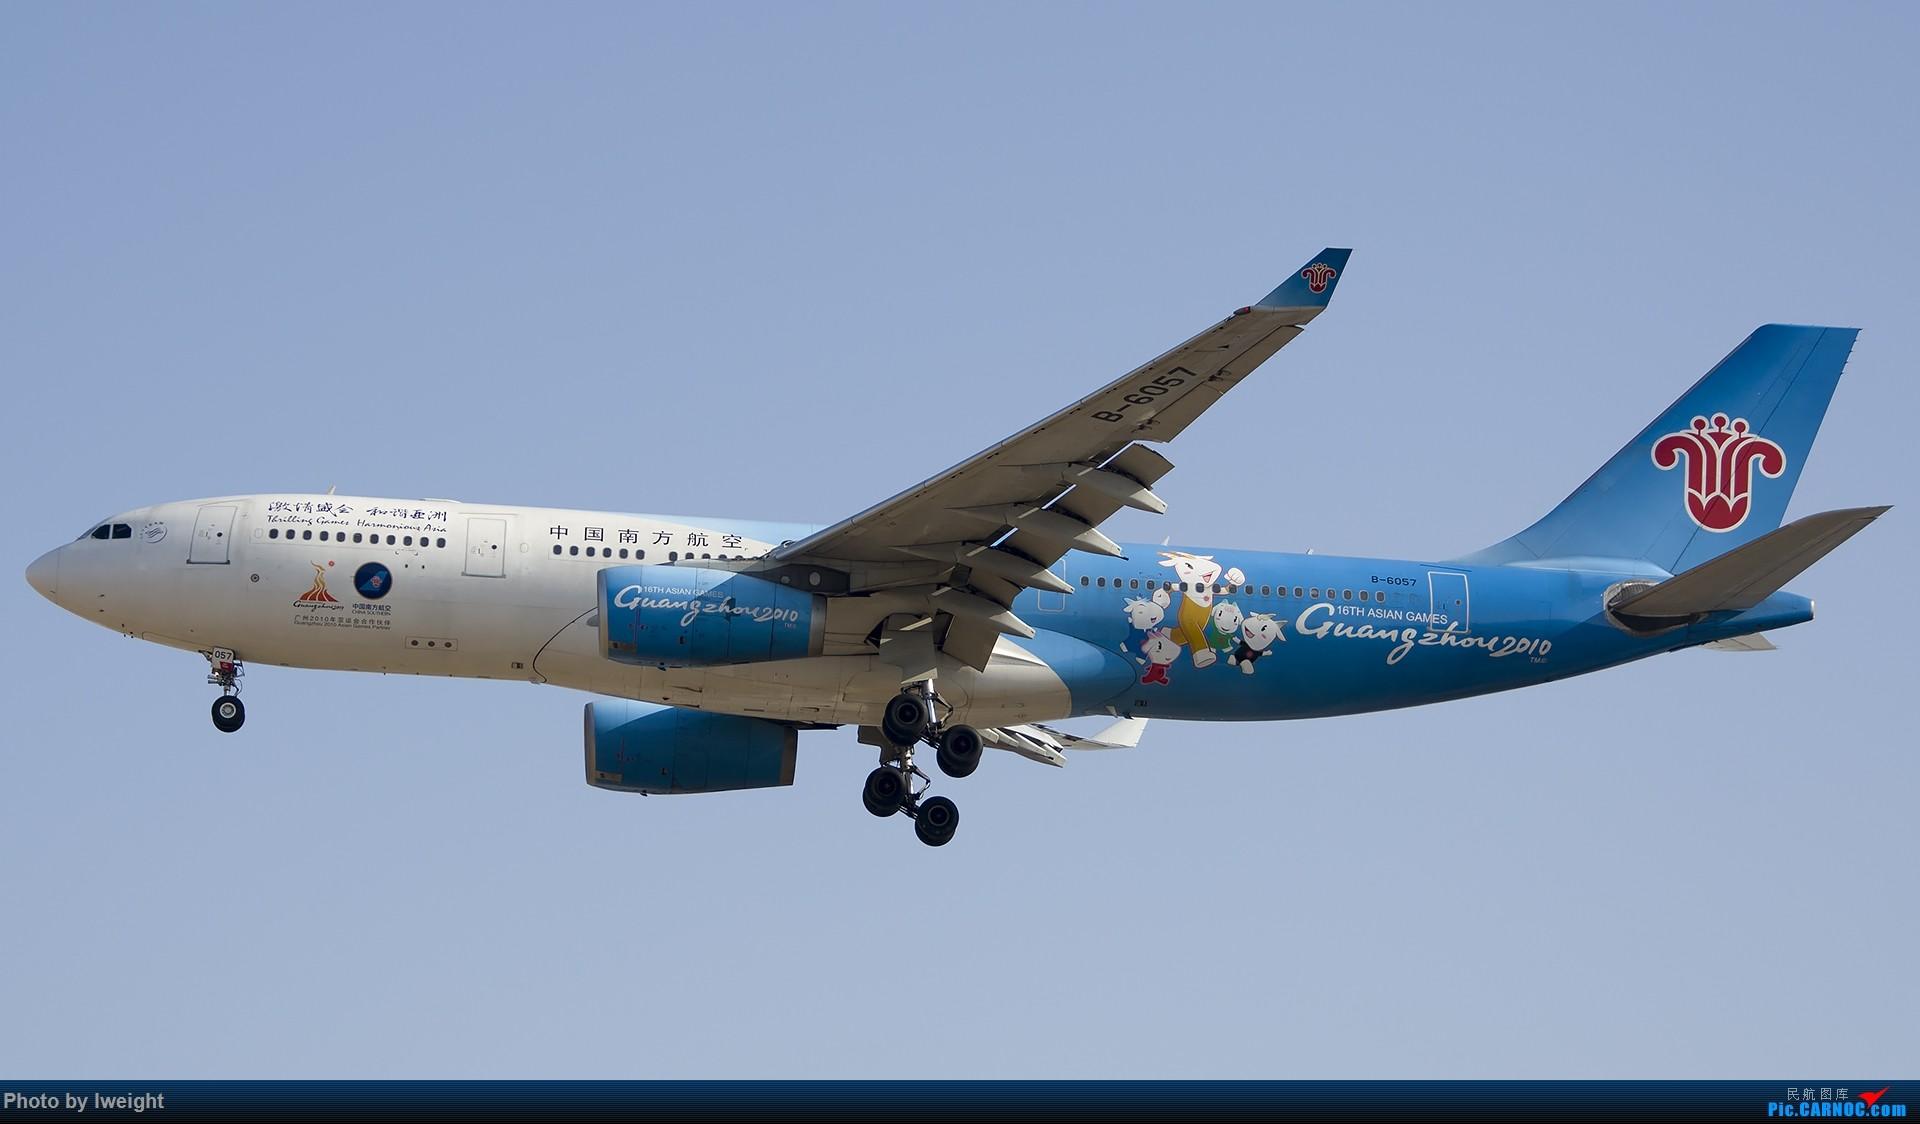 Re:[原创]庆祝升级777,发上今天在首都机场拍的所有飞机【2014-12-14】 AIRBUS A330-200 B-6057 中国北京首都国际机场